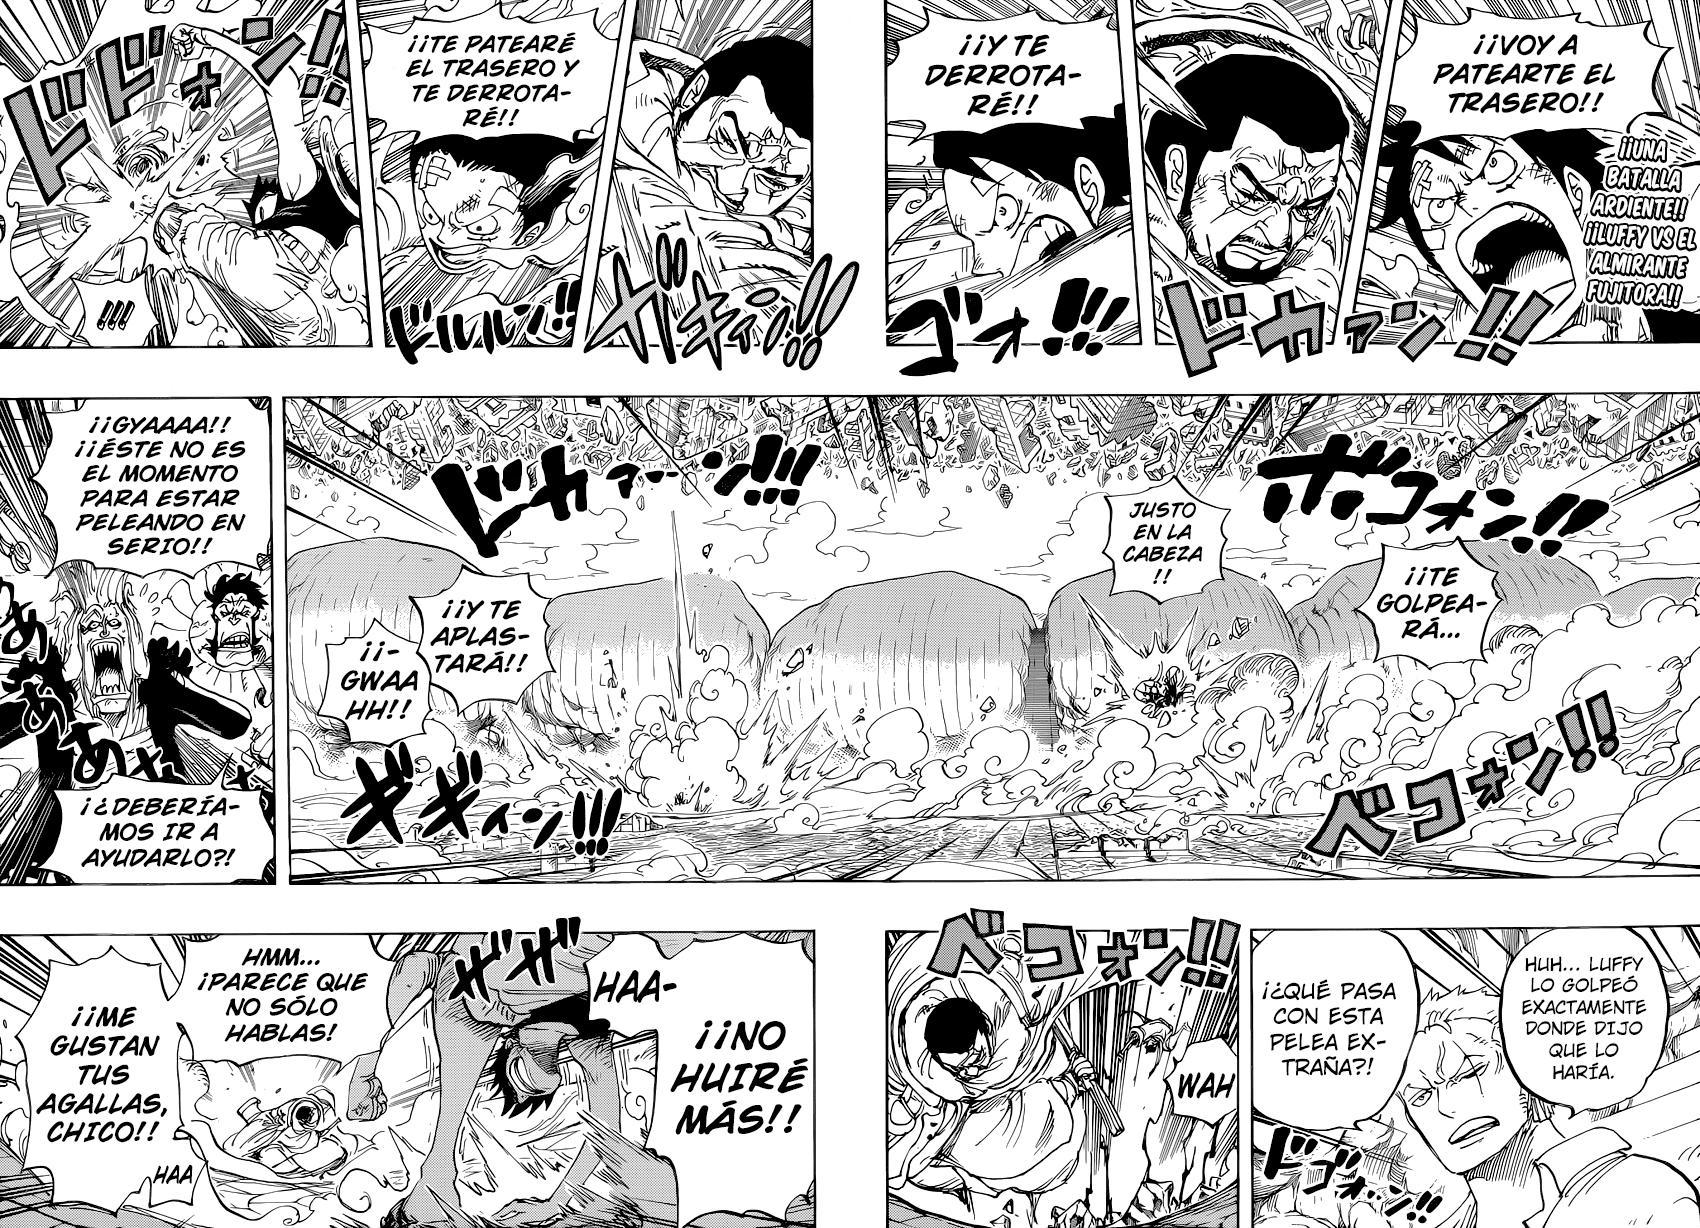 http://c5.ninemanga.com/es_manga/50/114/415173/eee7f5aab63a64284ae9dcac26ddbe03.jpg Page 3